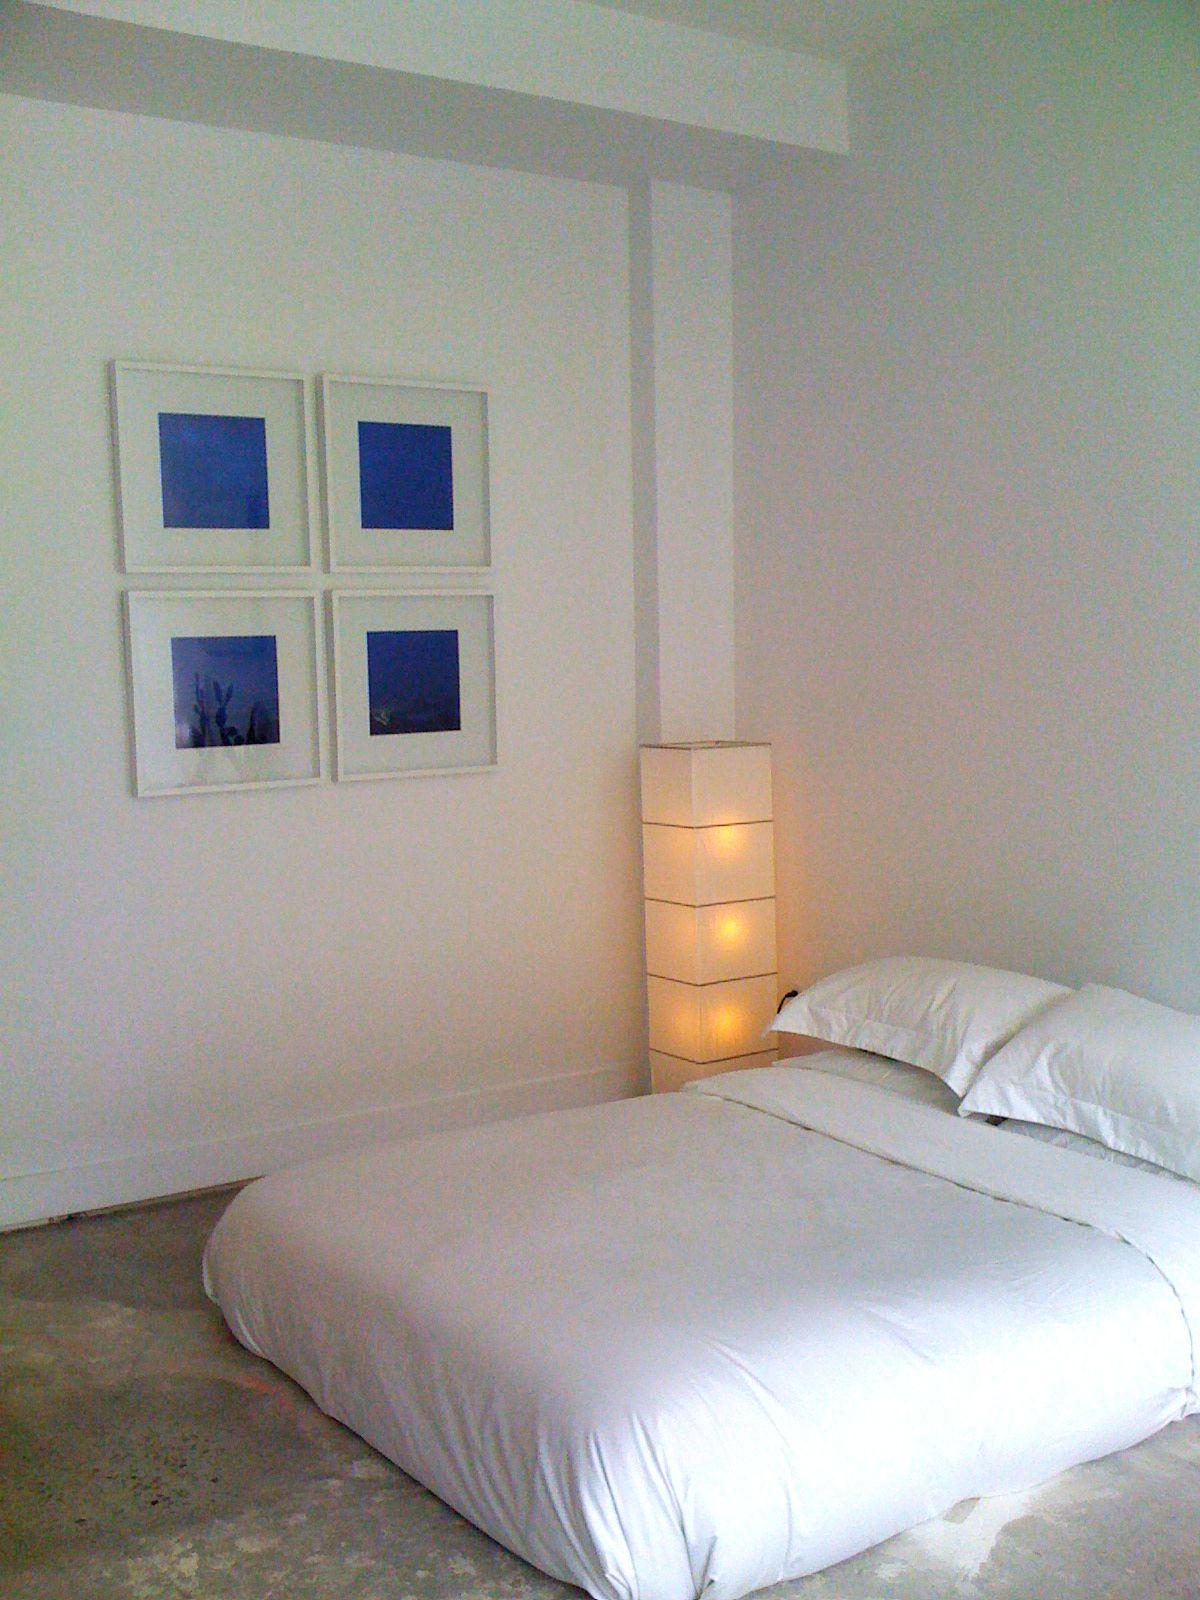 Best Simple Floor Bed With Nice Ambient Lighting Concrete 640 x 480